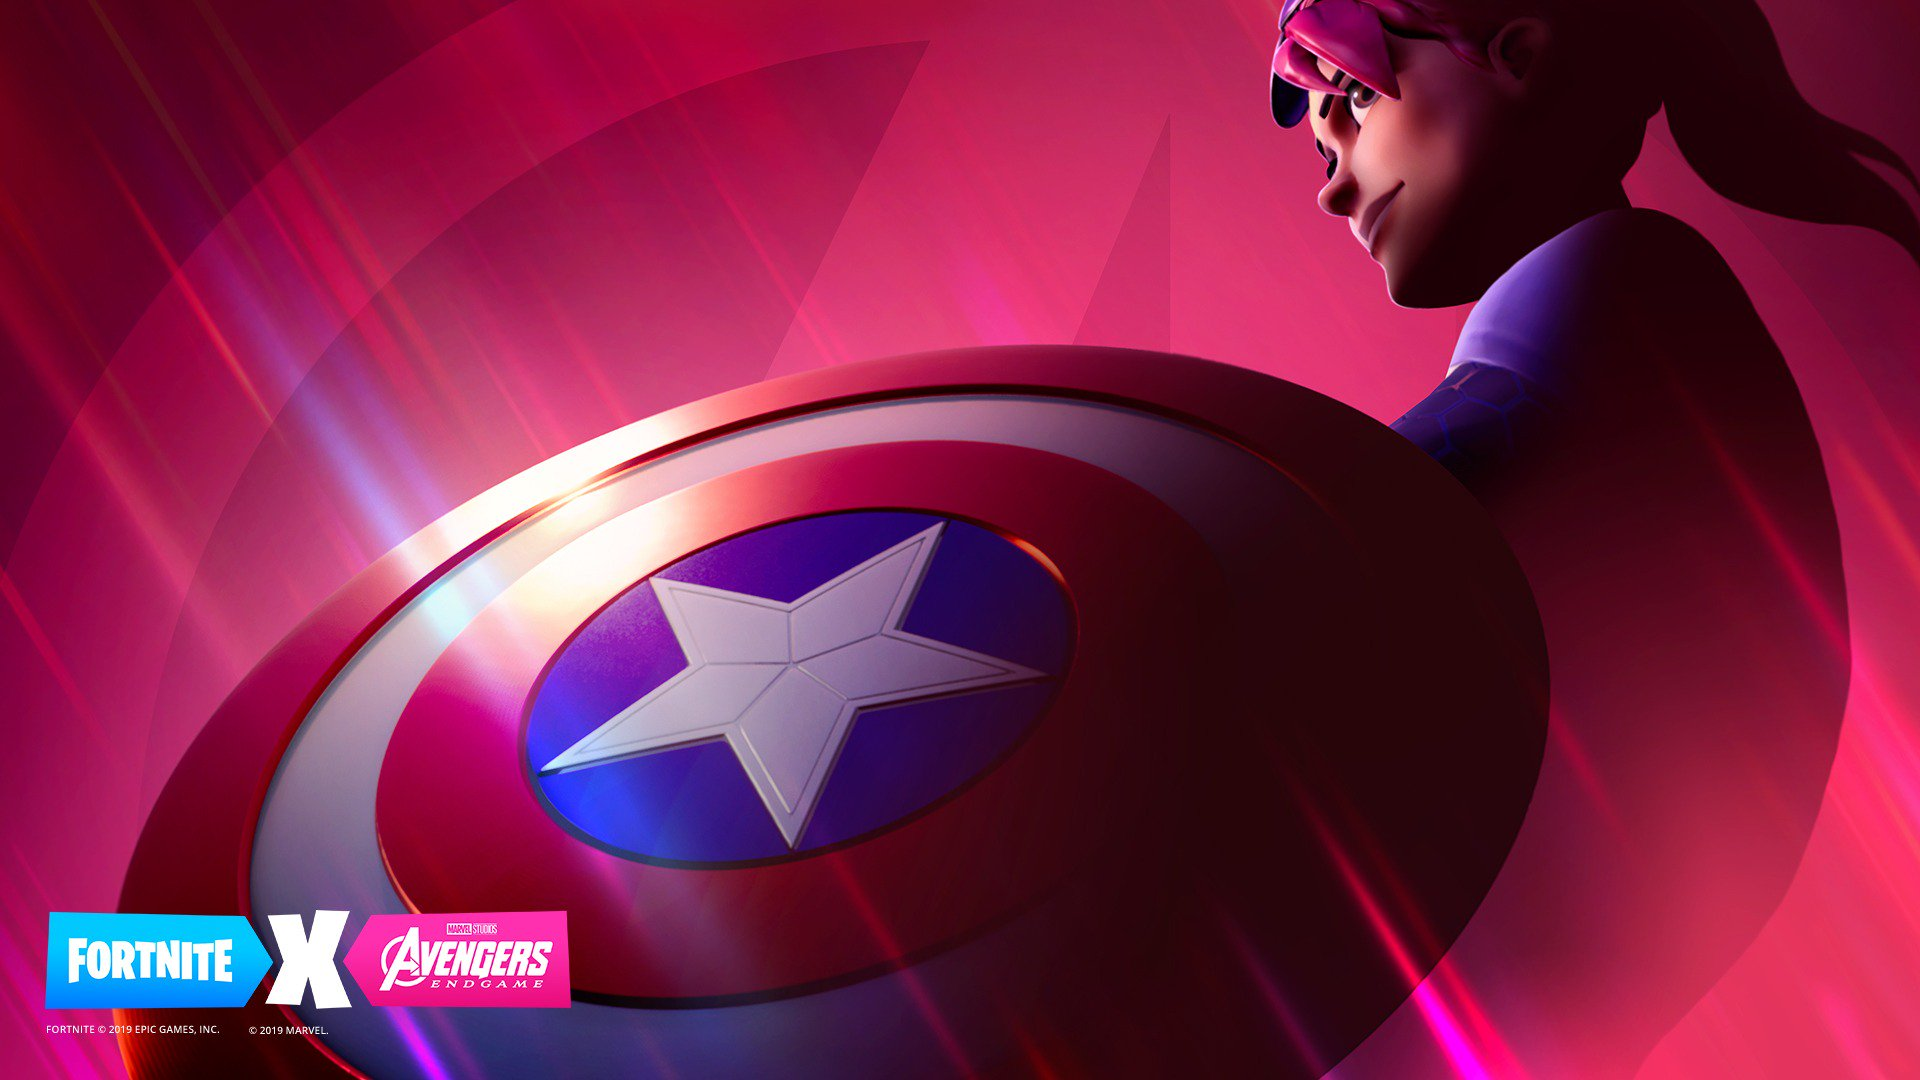 Fortnite is teasing another Avengers crossover for Endgame